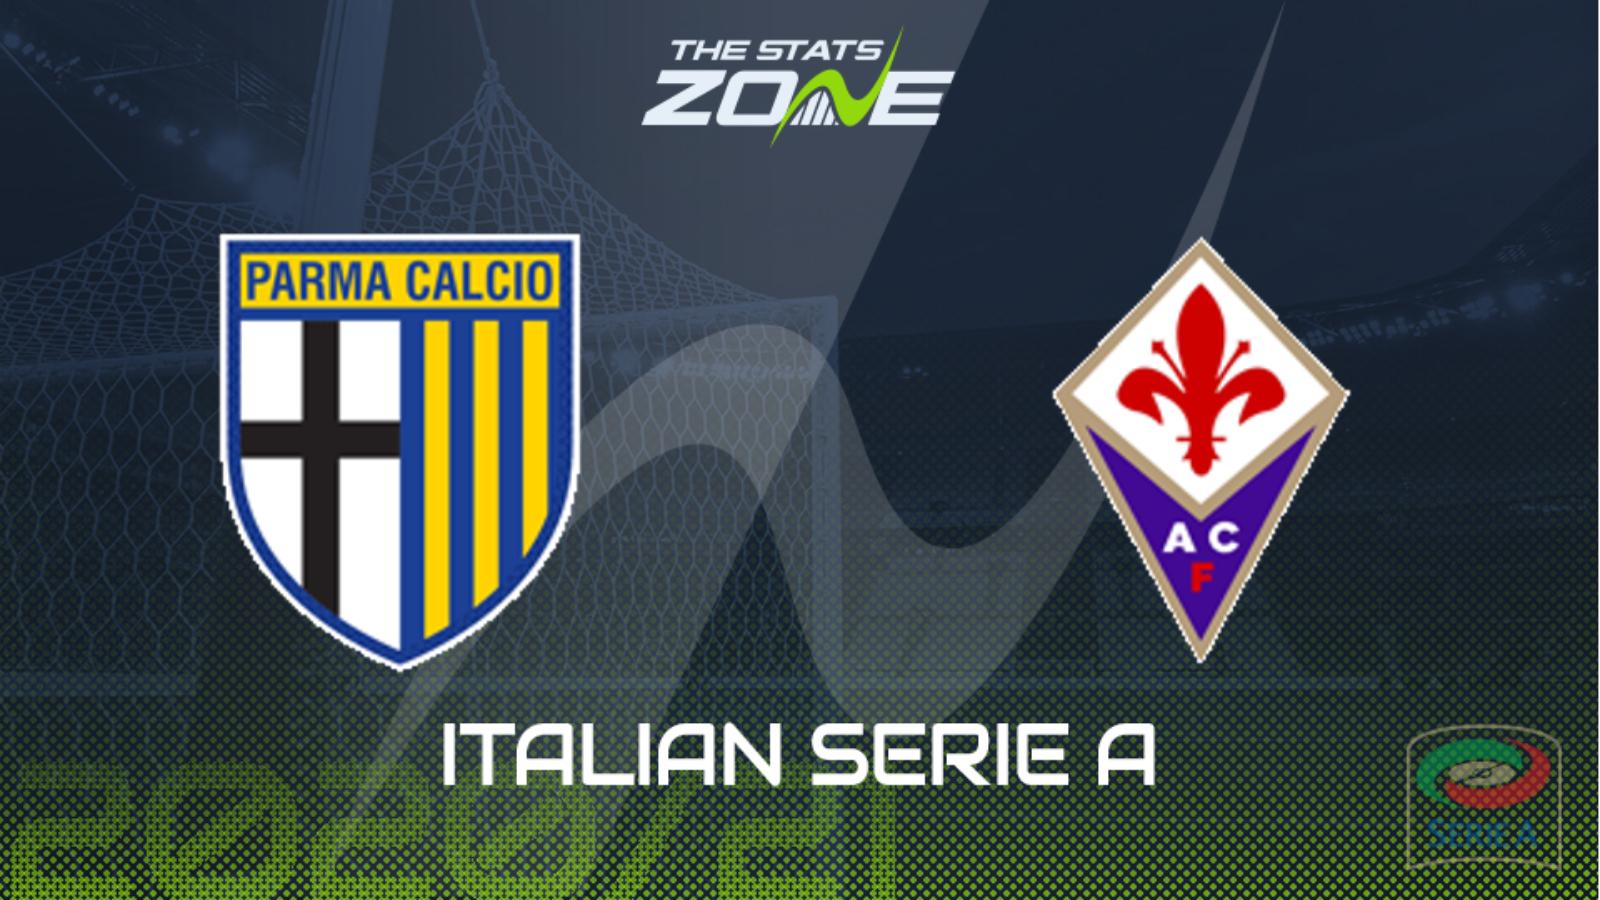 Parma fiorentina betting previews wba manager sky betting